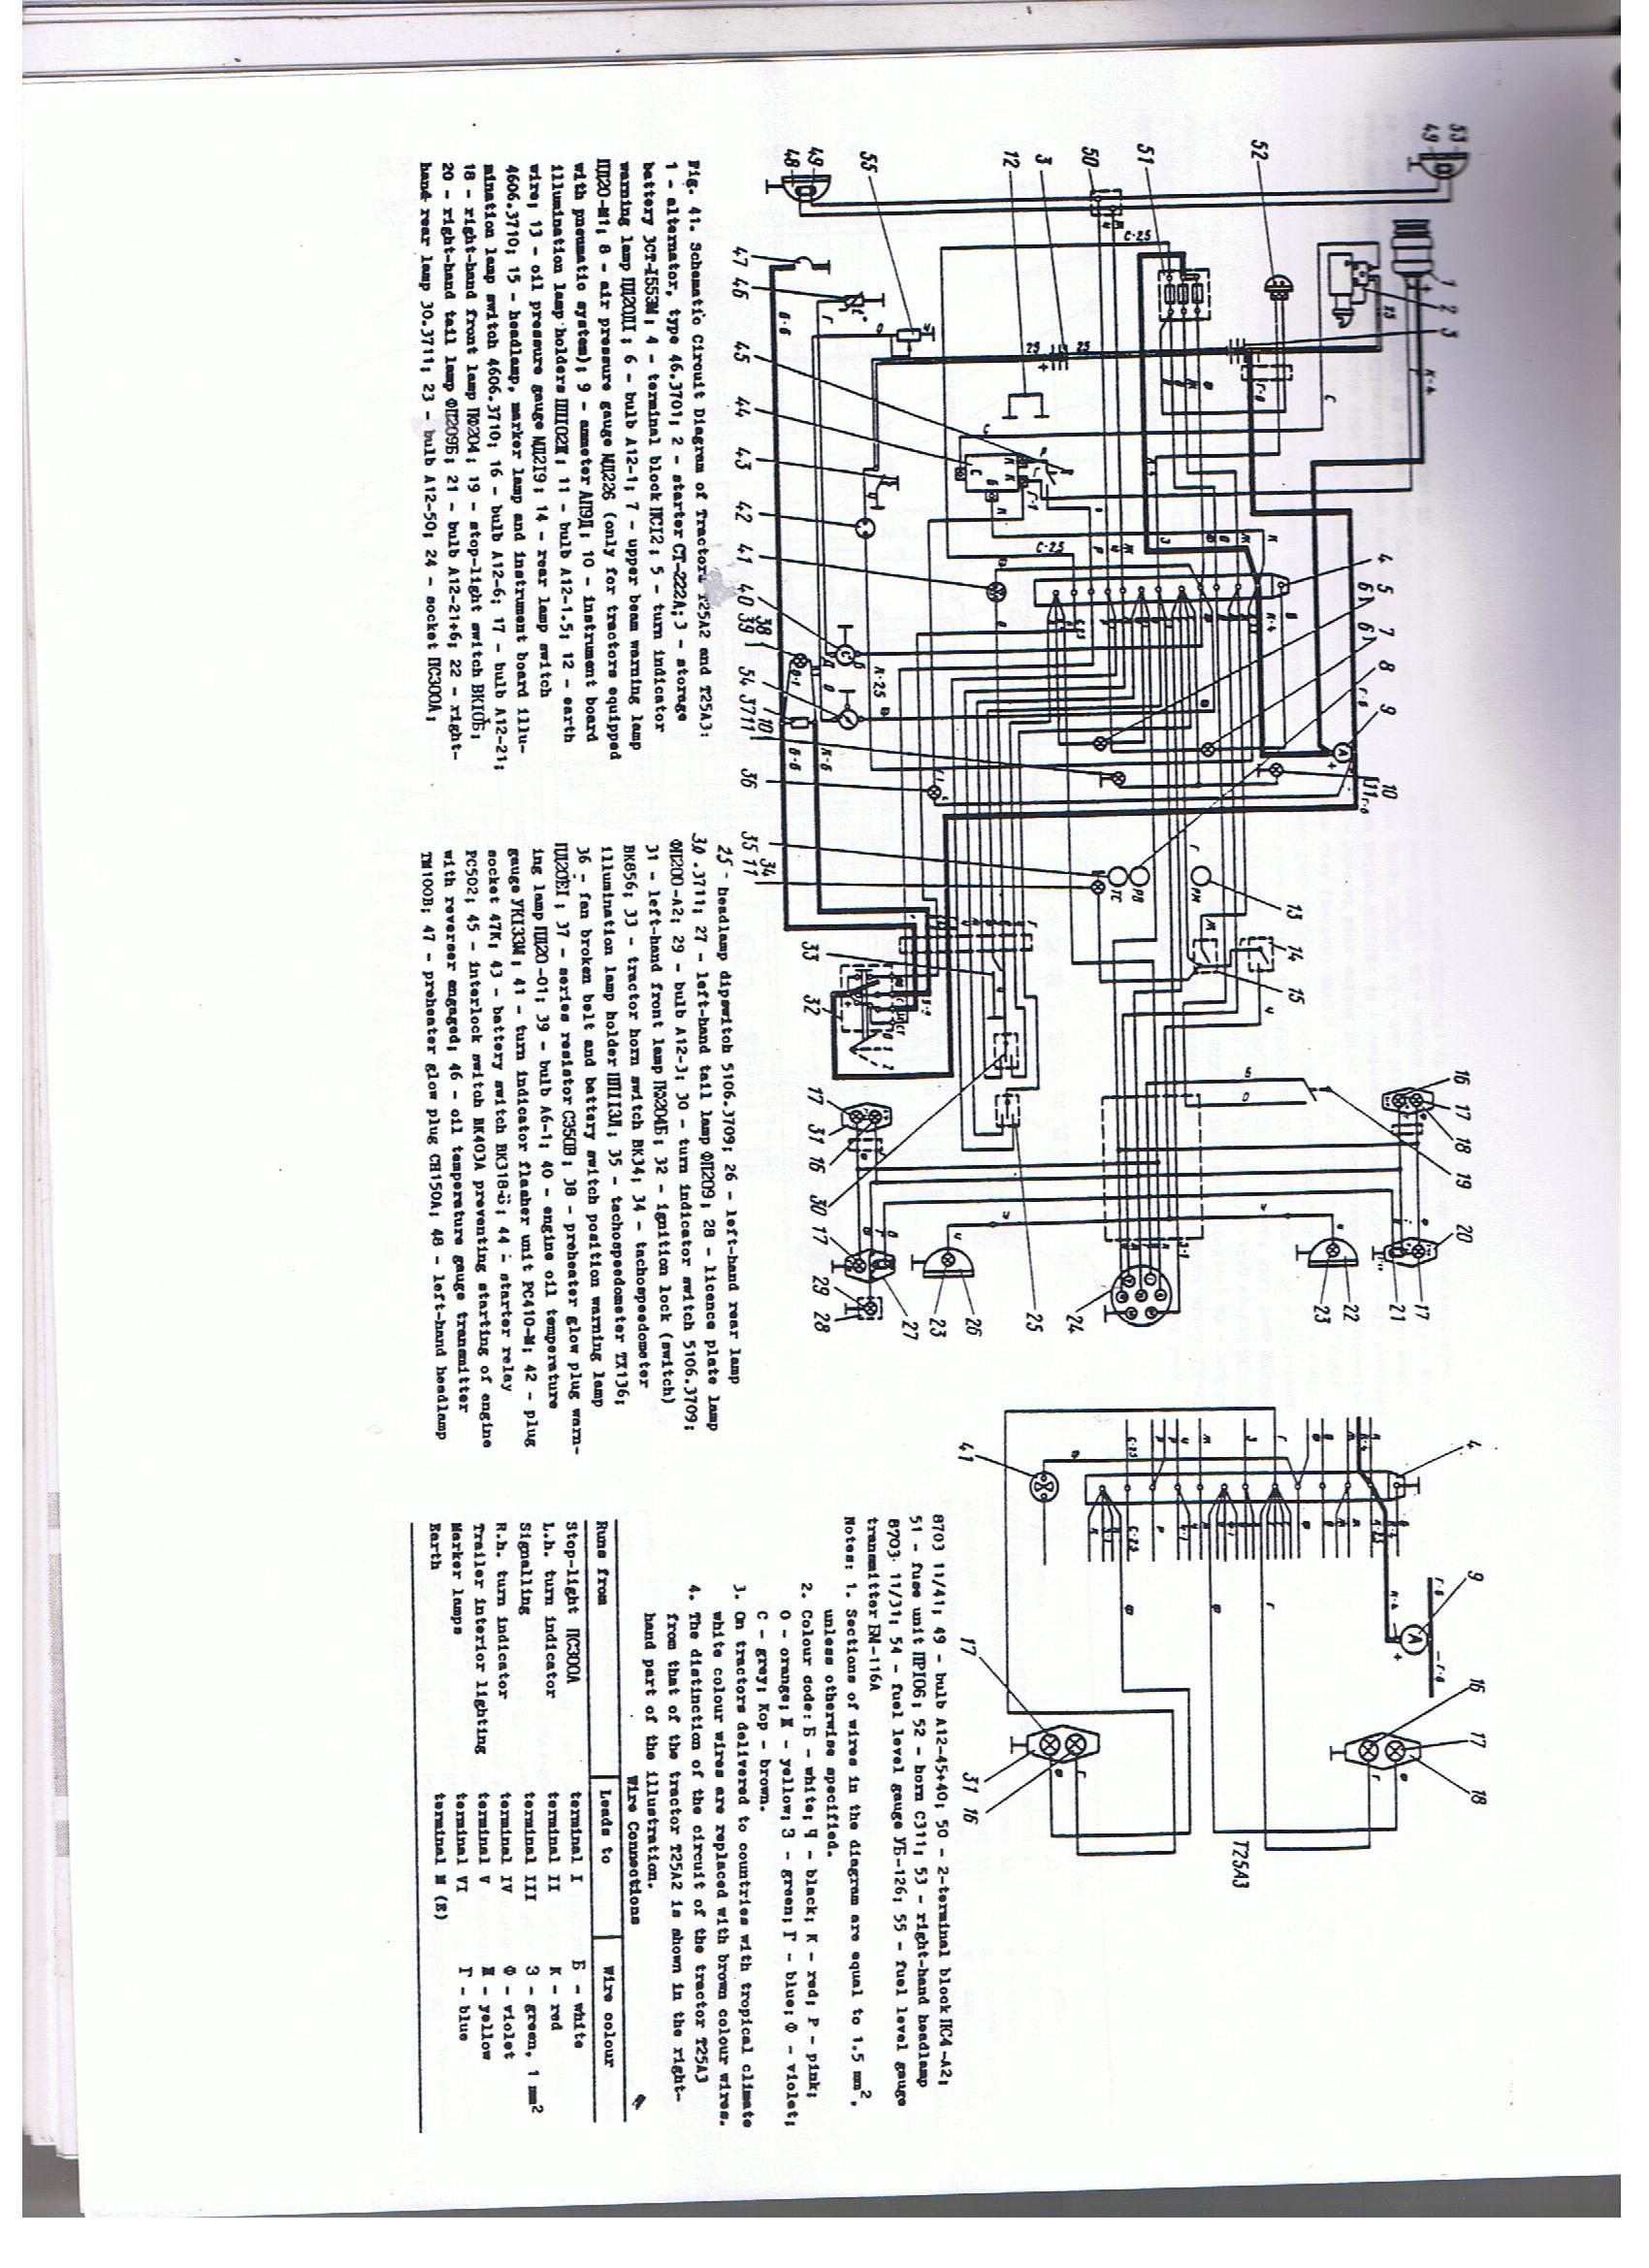 belarus tractor wiring diagram - sony cdx gt56uiw wiring diagram -  jaguars.ab18.jeanjaures37.fr  wiring diagram resource